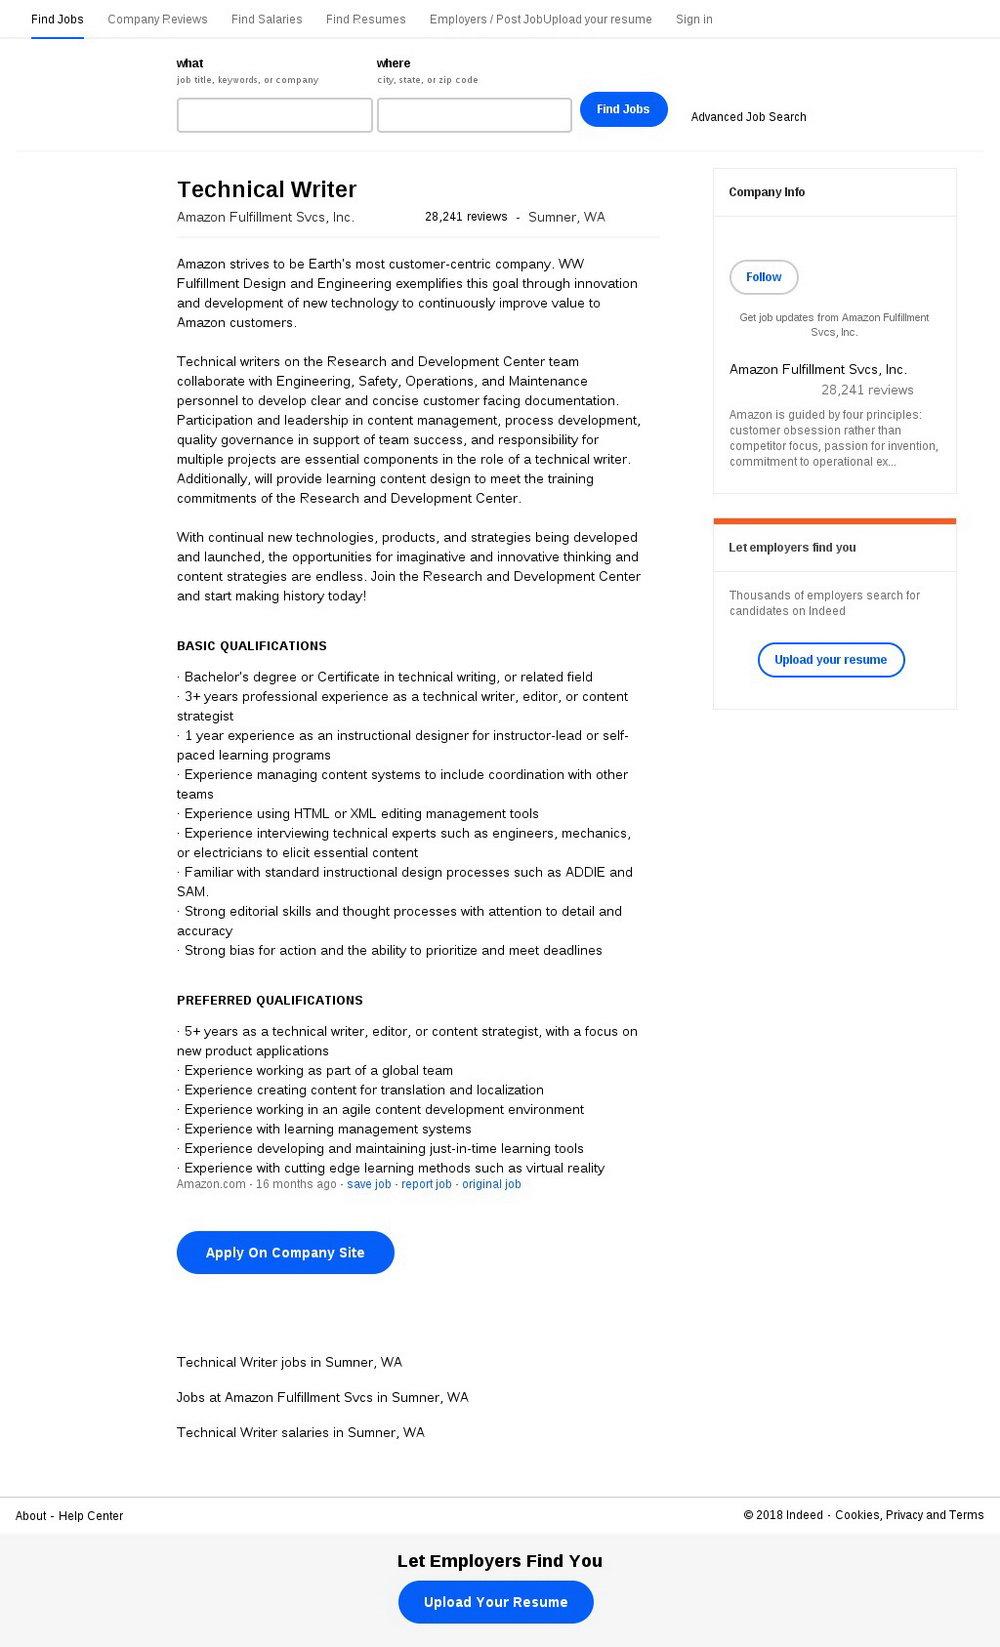 Amazon Fulfillment Job Application